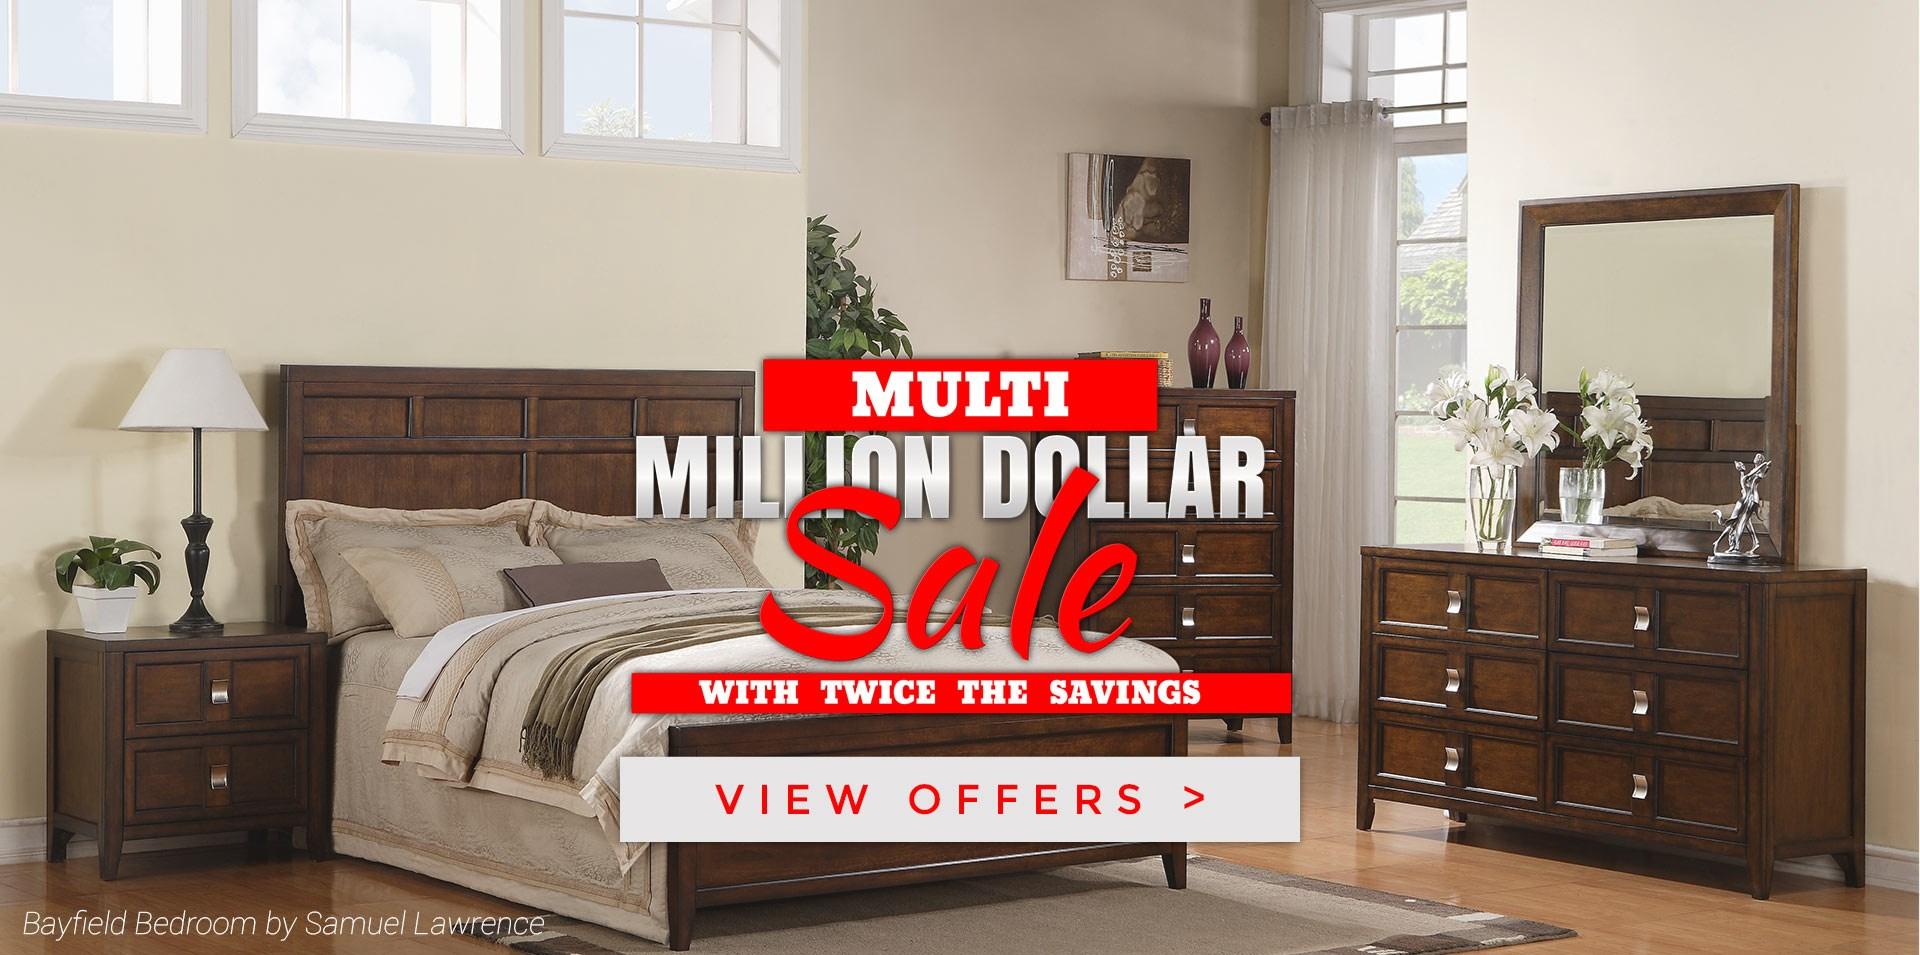 sale offers